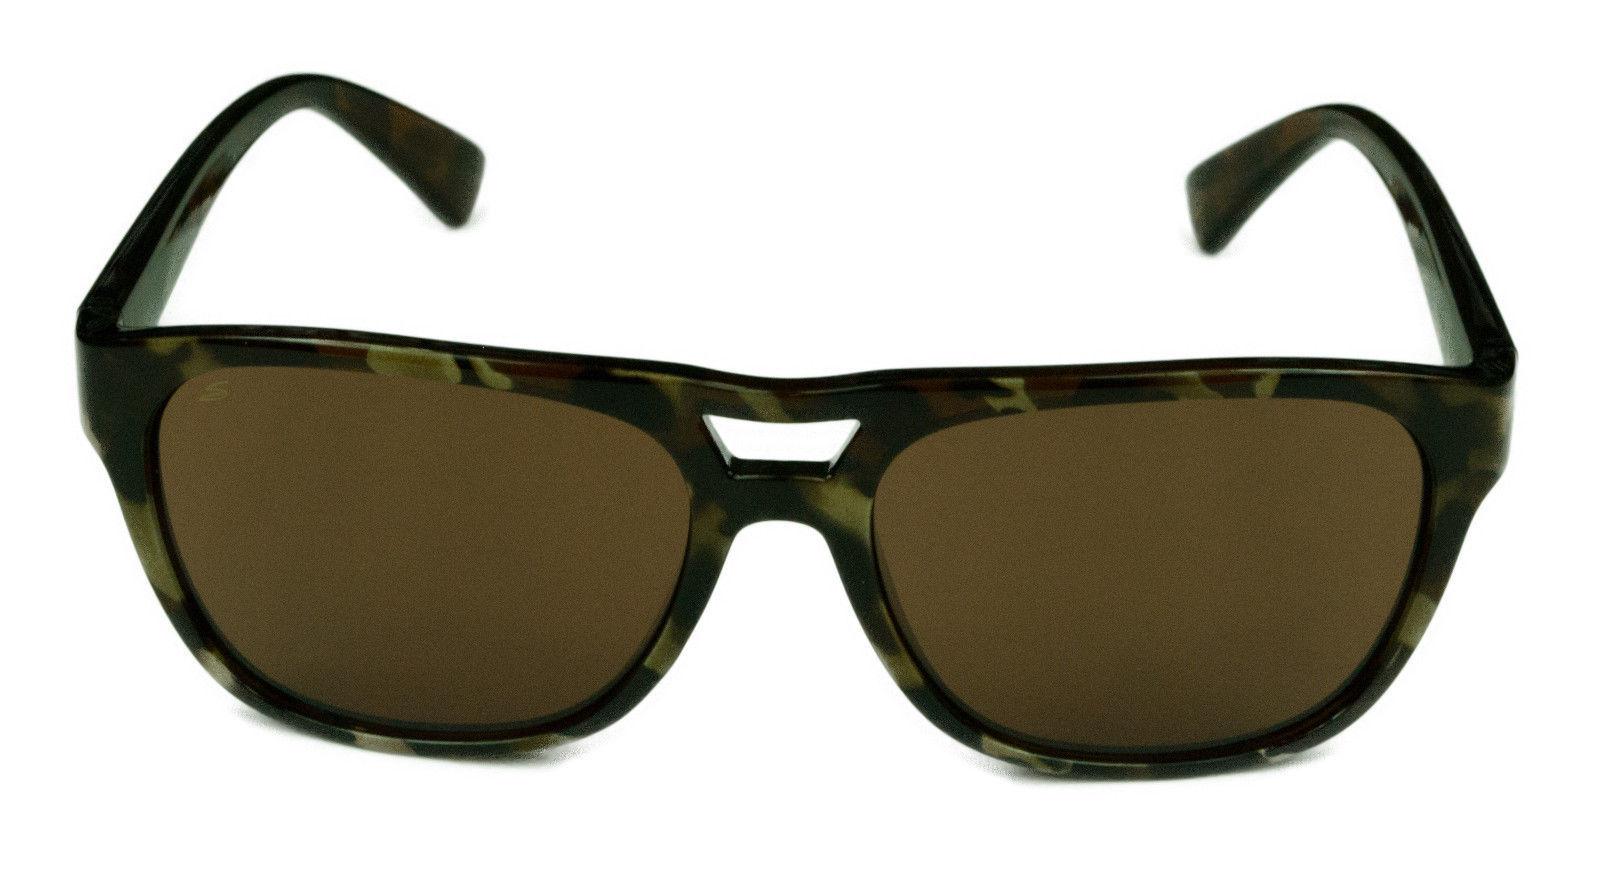 9ce5770b69 Serengeti Tommaso Sunglasses - Shiny Taupe Tortoise w  Non-Polarized lens -  7958